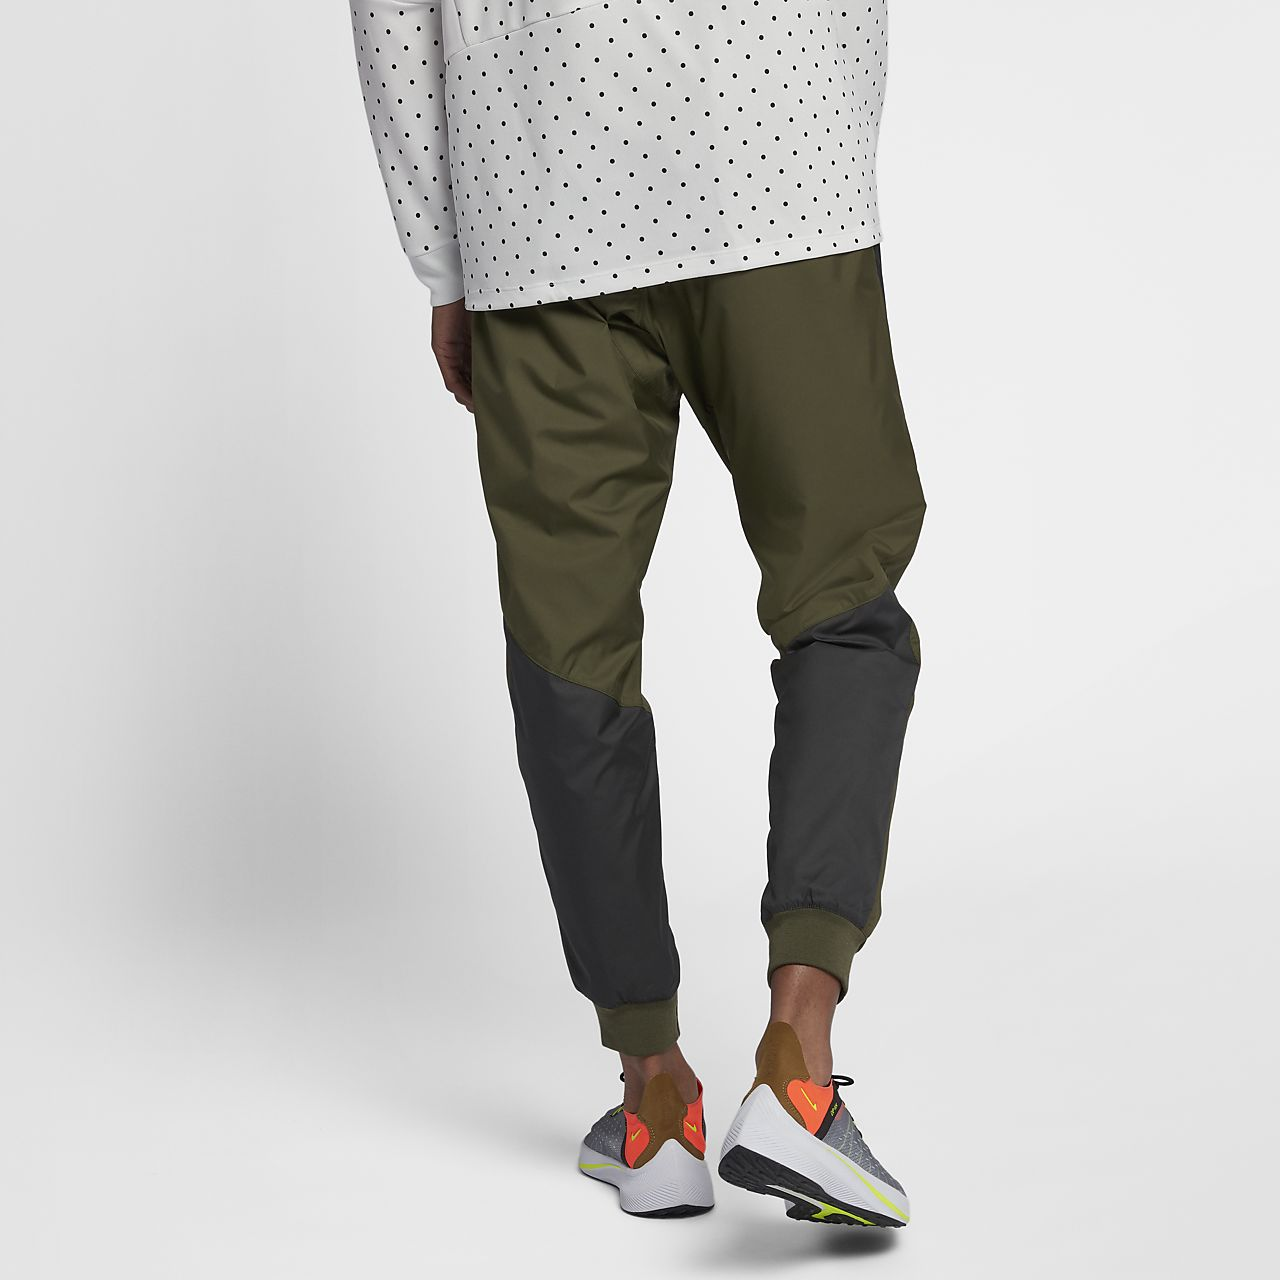 timeless design 21344 ea0e4 Low Resolution Nike Sportswear Windrunner Mens Pants Nike Sportswear  Windrunner Mens Pants